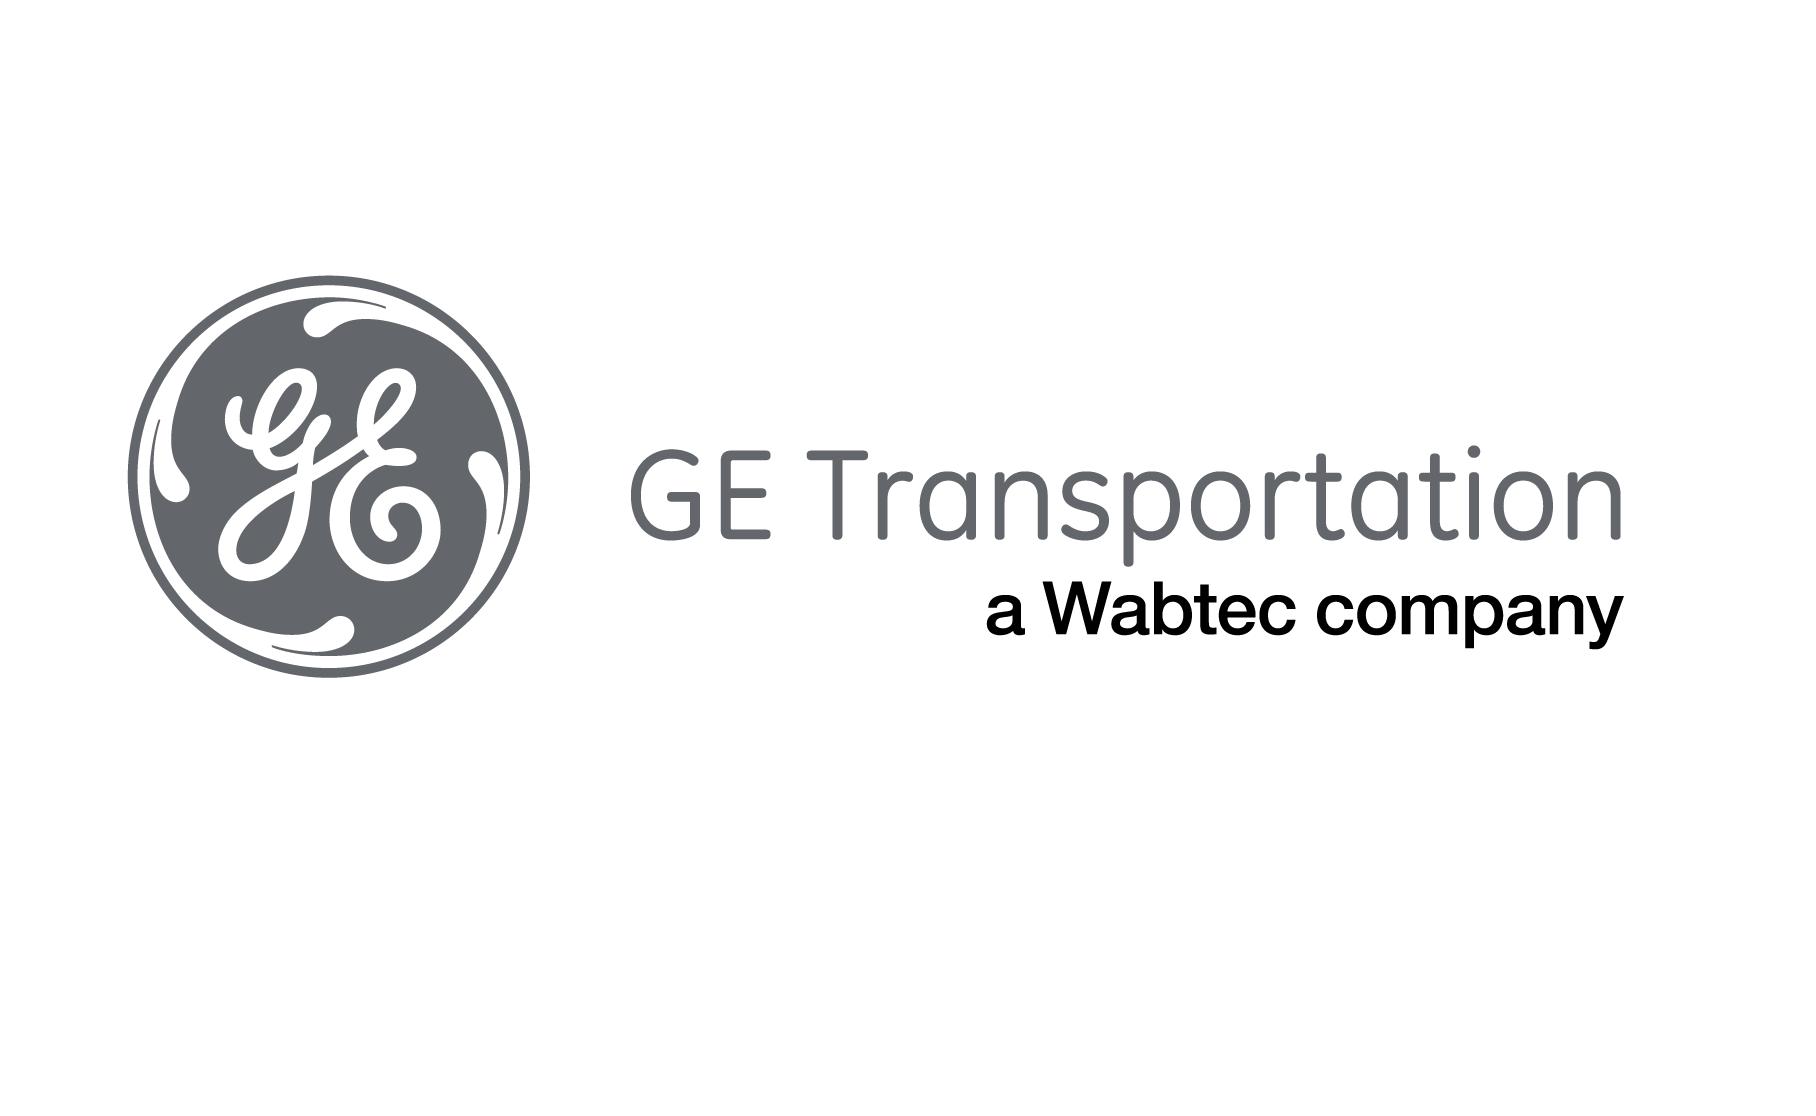 GE Transportation, a Wabtec Company 1